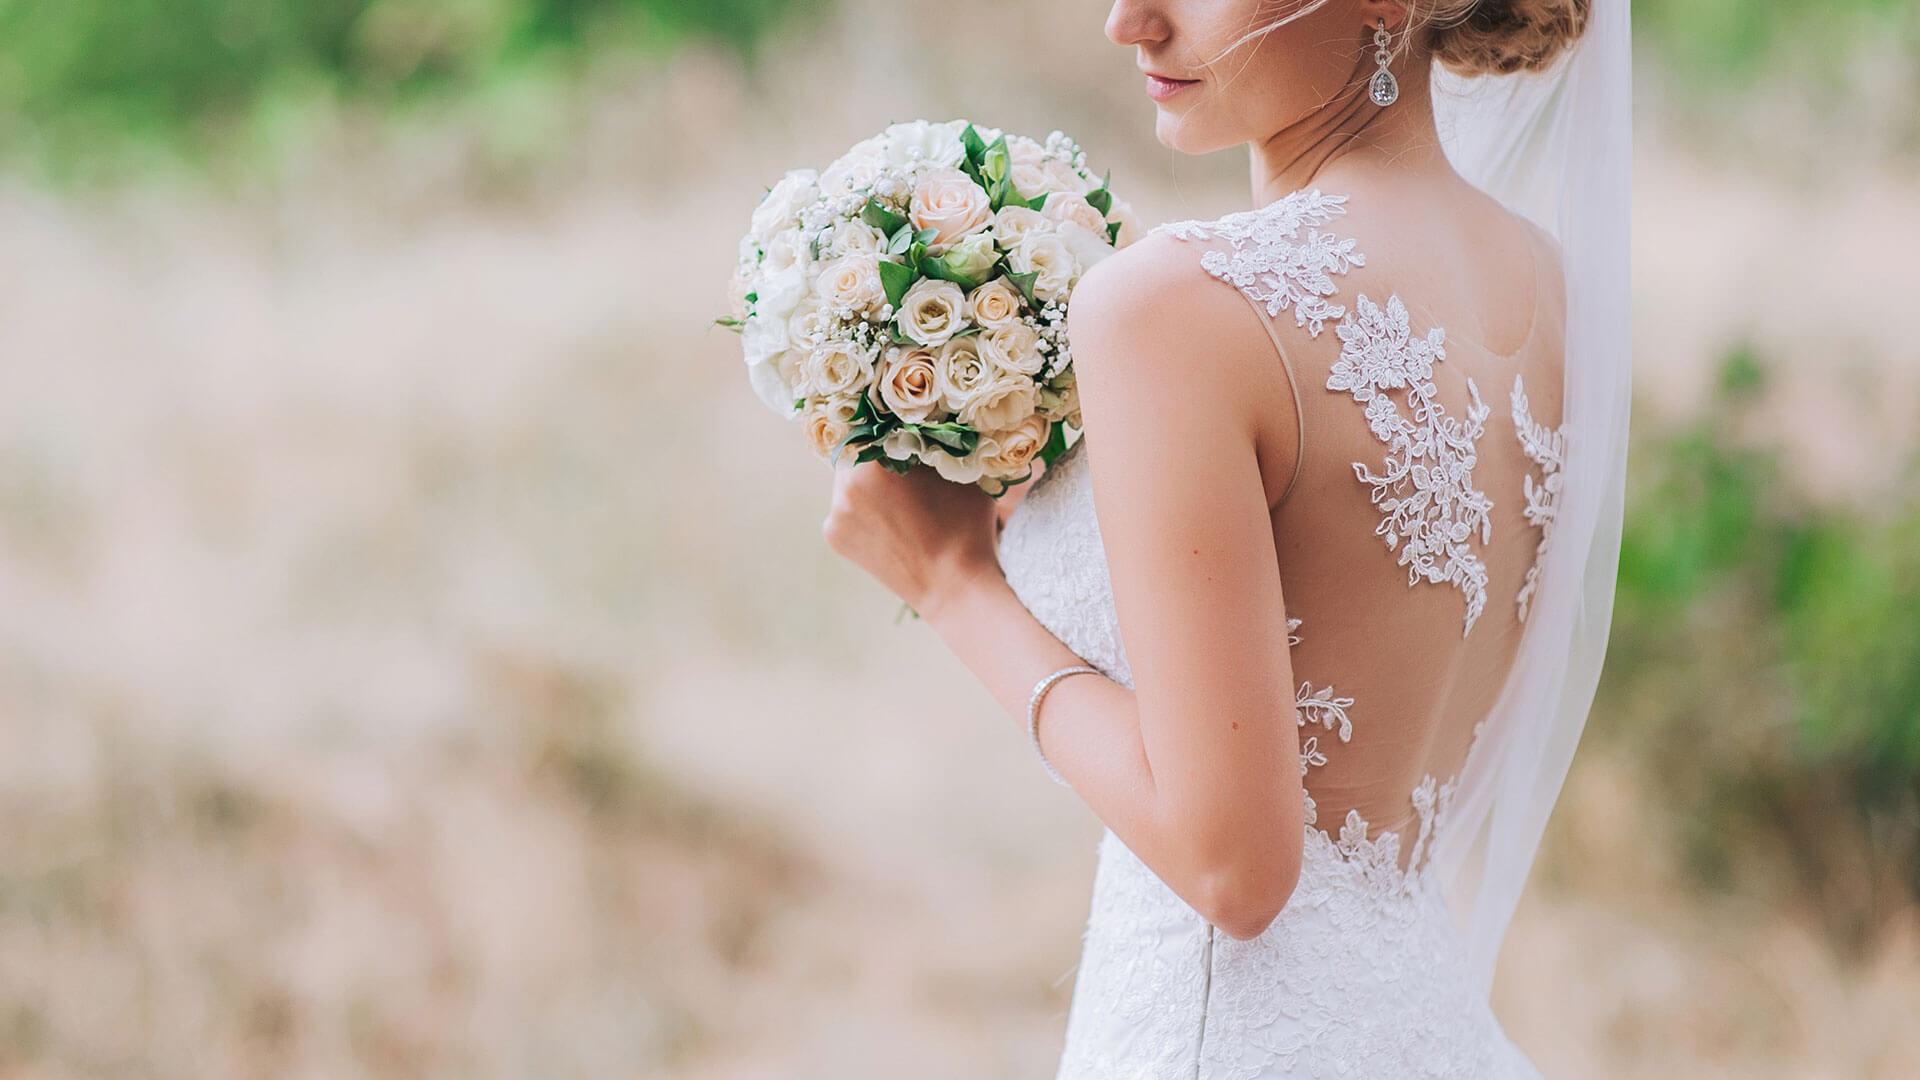 Global Wedding Awards - Lux Magazine